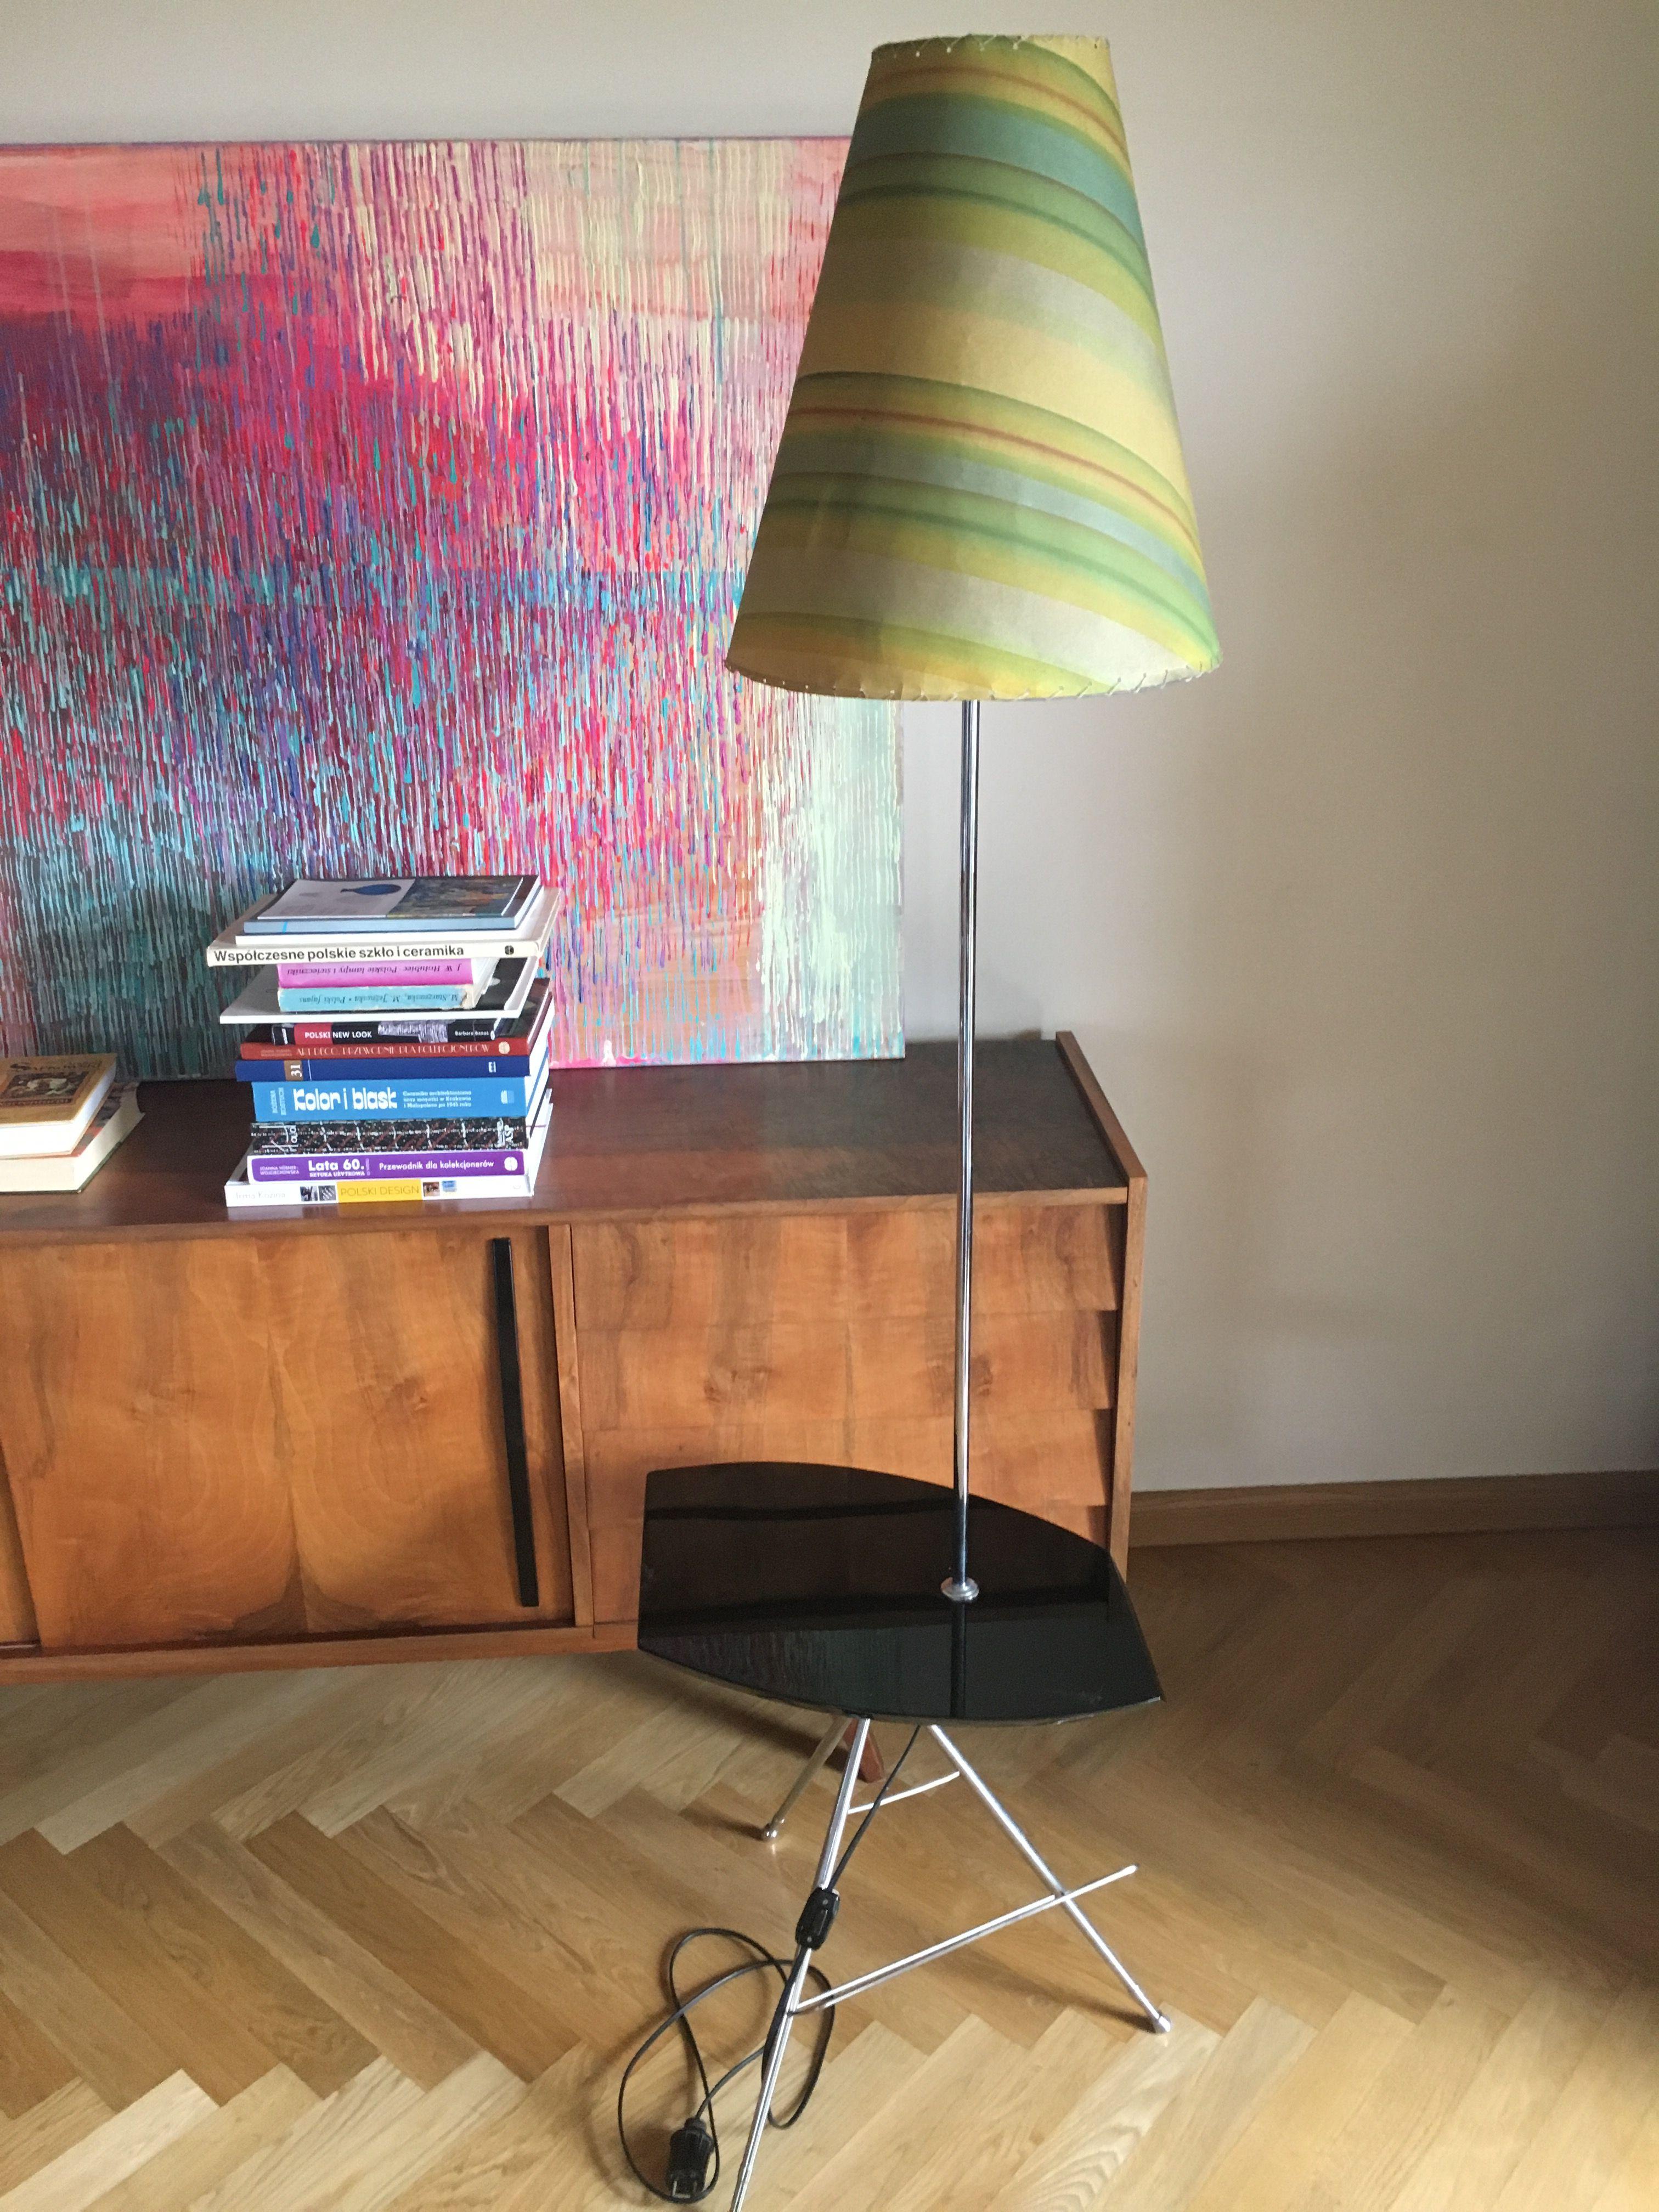 Lampa Podlogowa Polska Lata 70 Oryginalny Abazur Furniture Design Design Home Decor